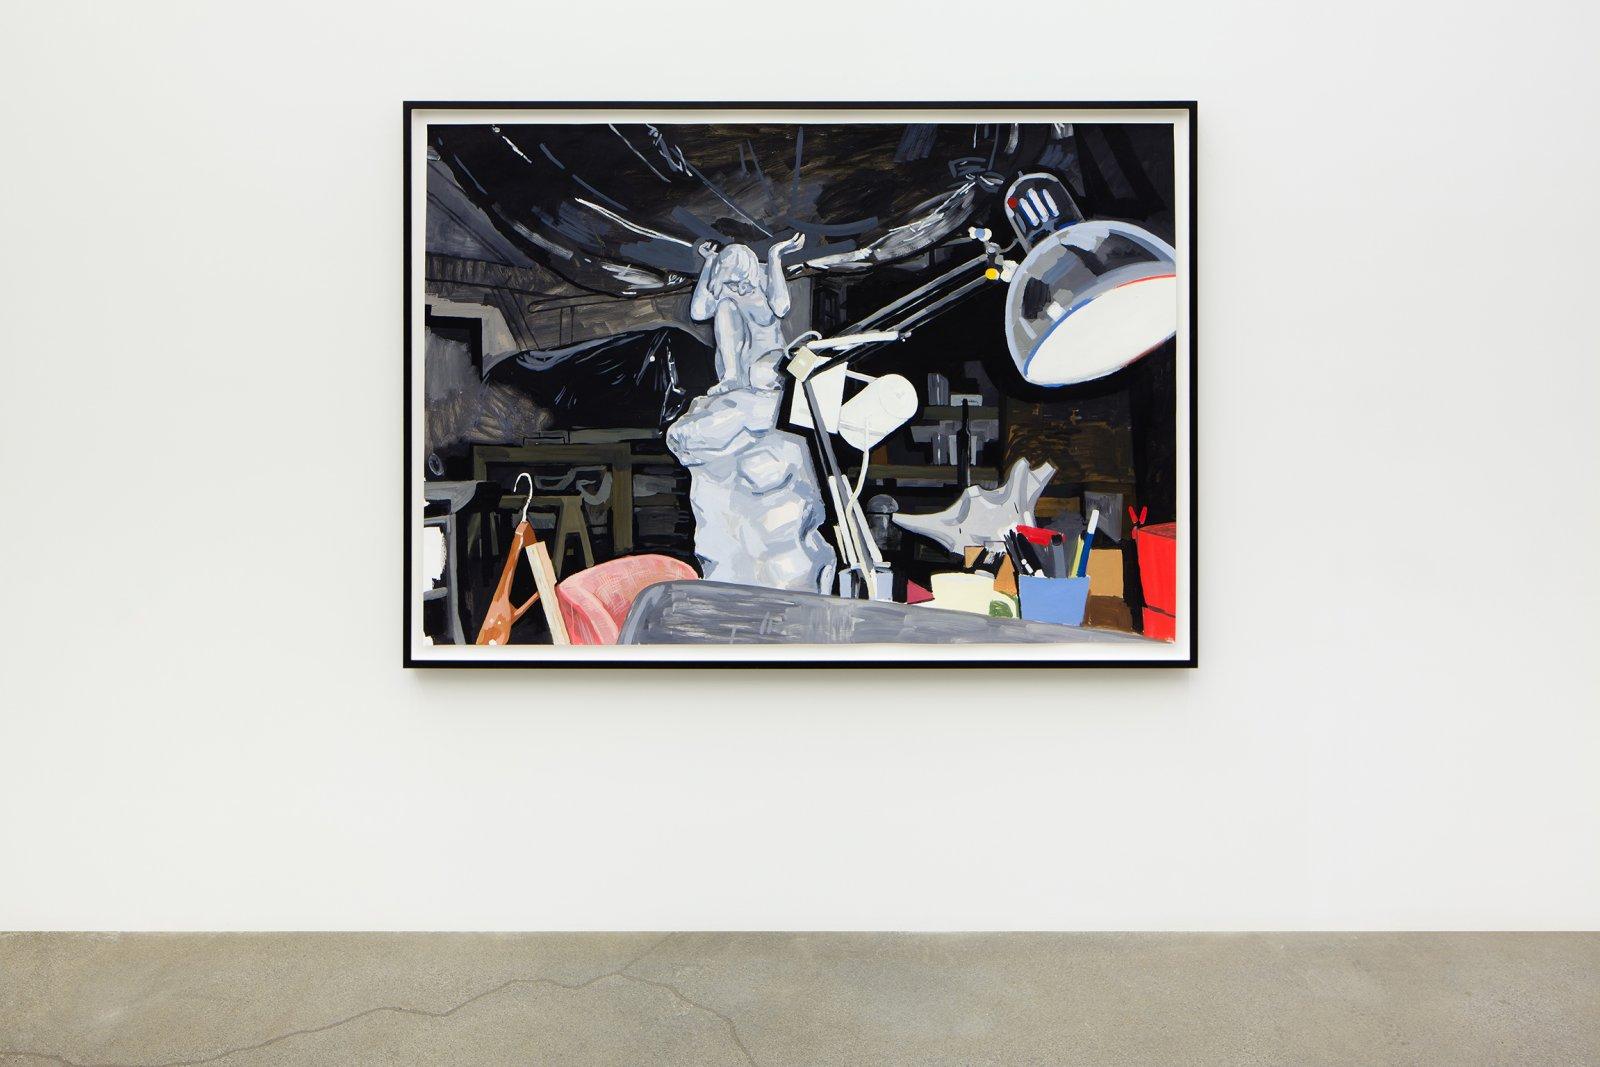 Damian Moppett, Caryatid, Lamp and Sofa in Studio, 2006, oil on paper, 58 x 81 in. (147 x 206 cm) by Damian Moppett